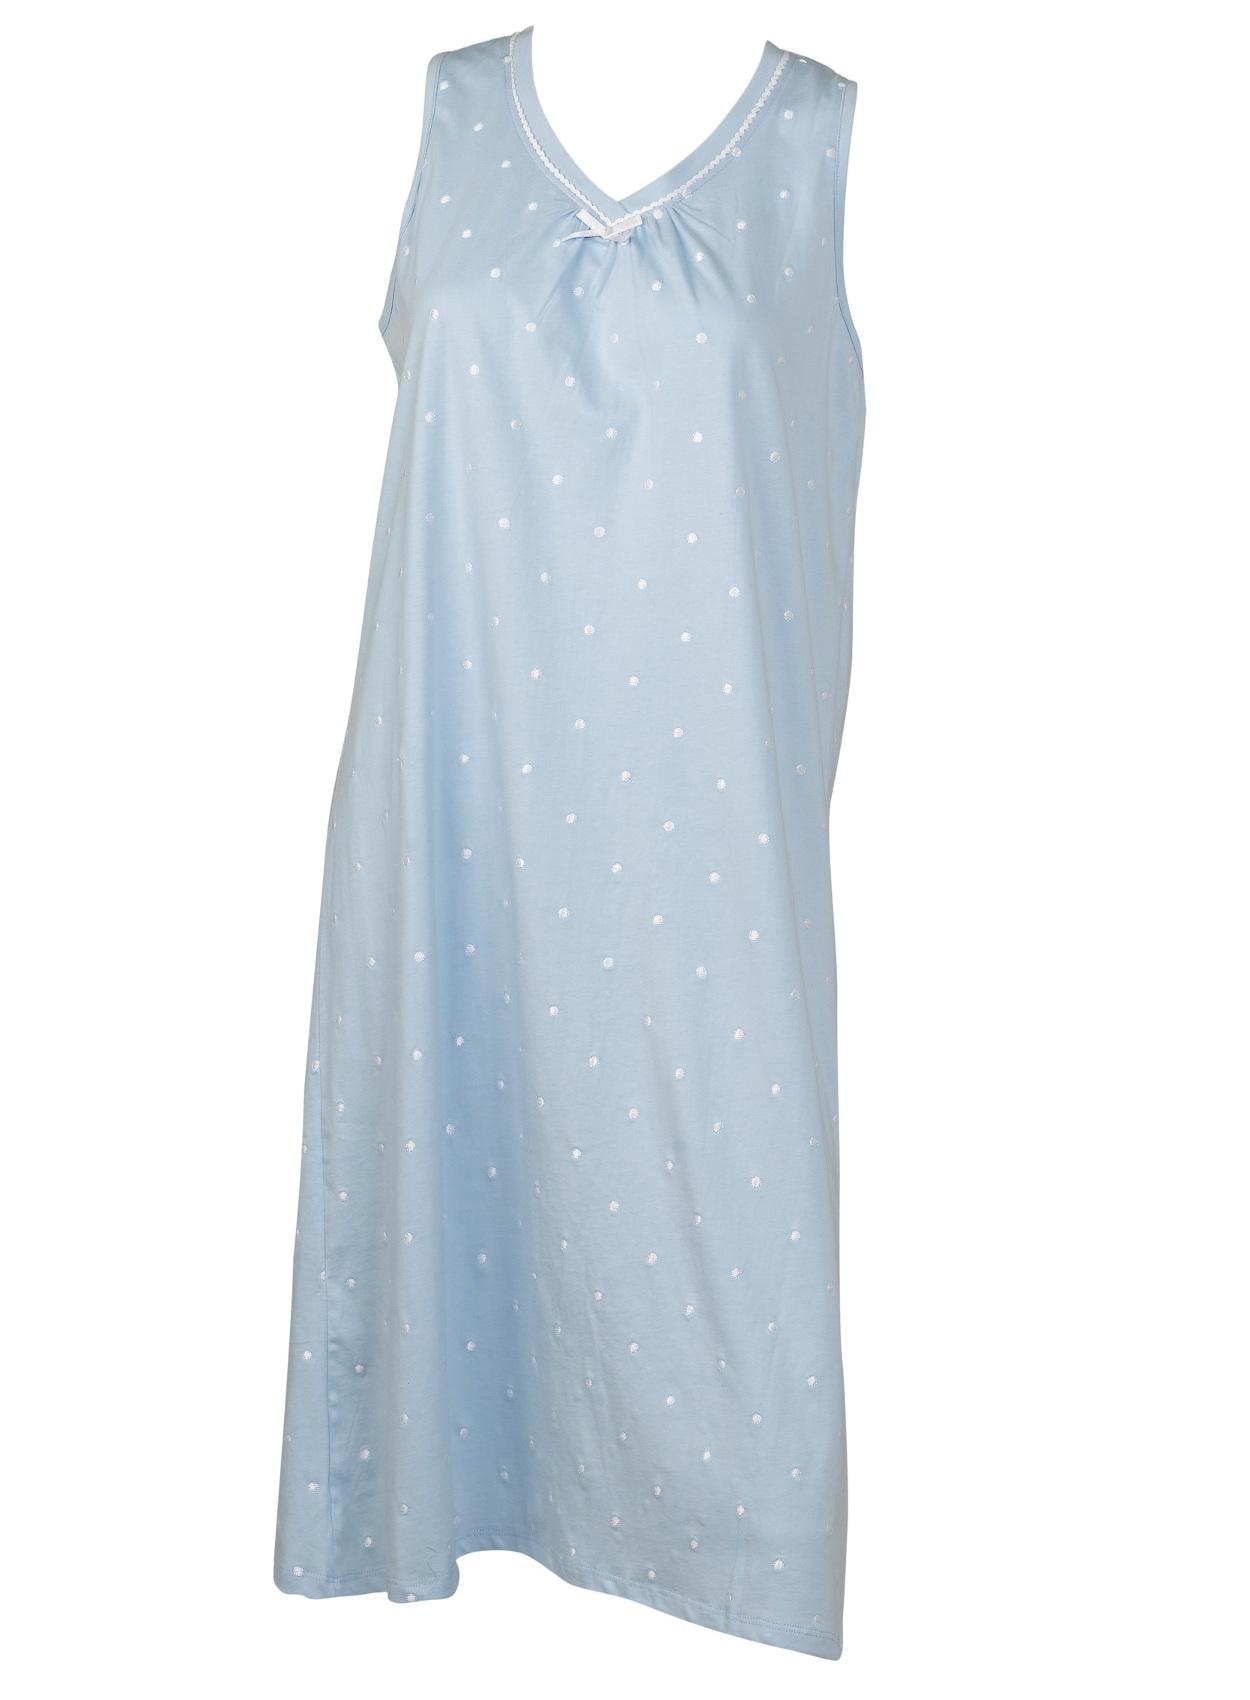 Nightdress 100% Cotton Dobby Dot Sleeveless Nightgown Womens Slenderella  Nightie 1242c24b2